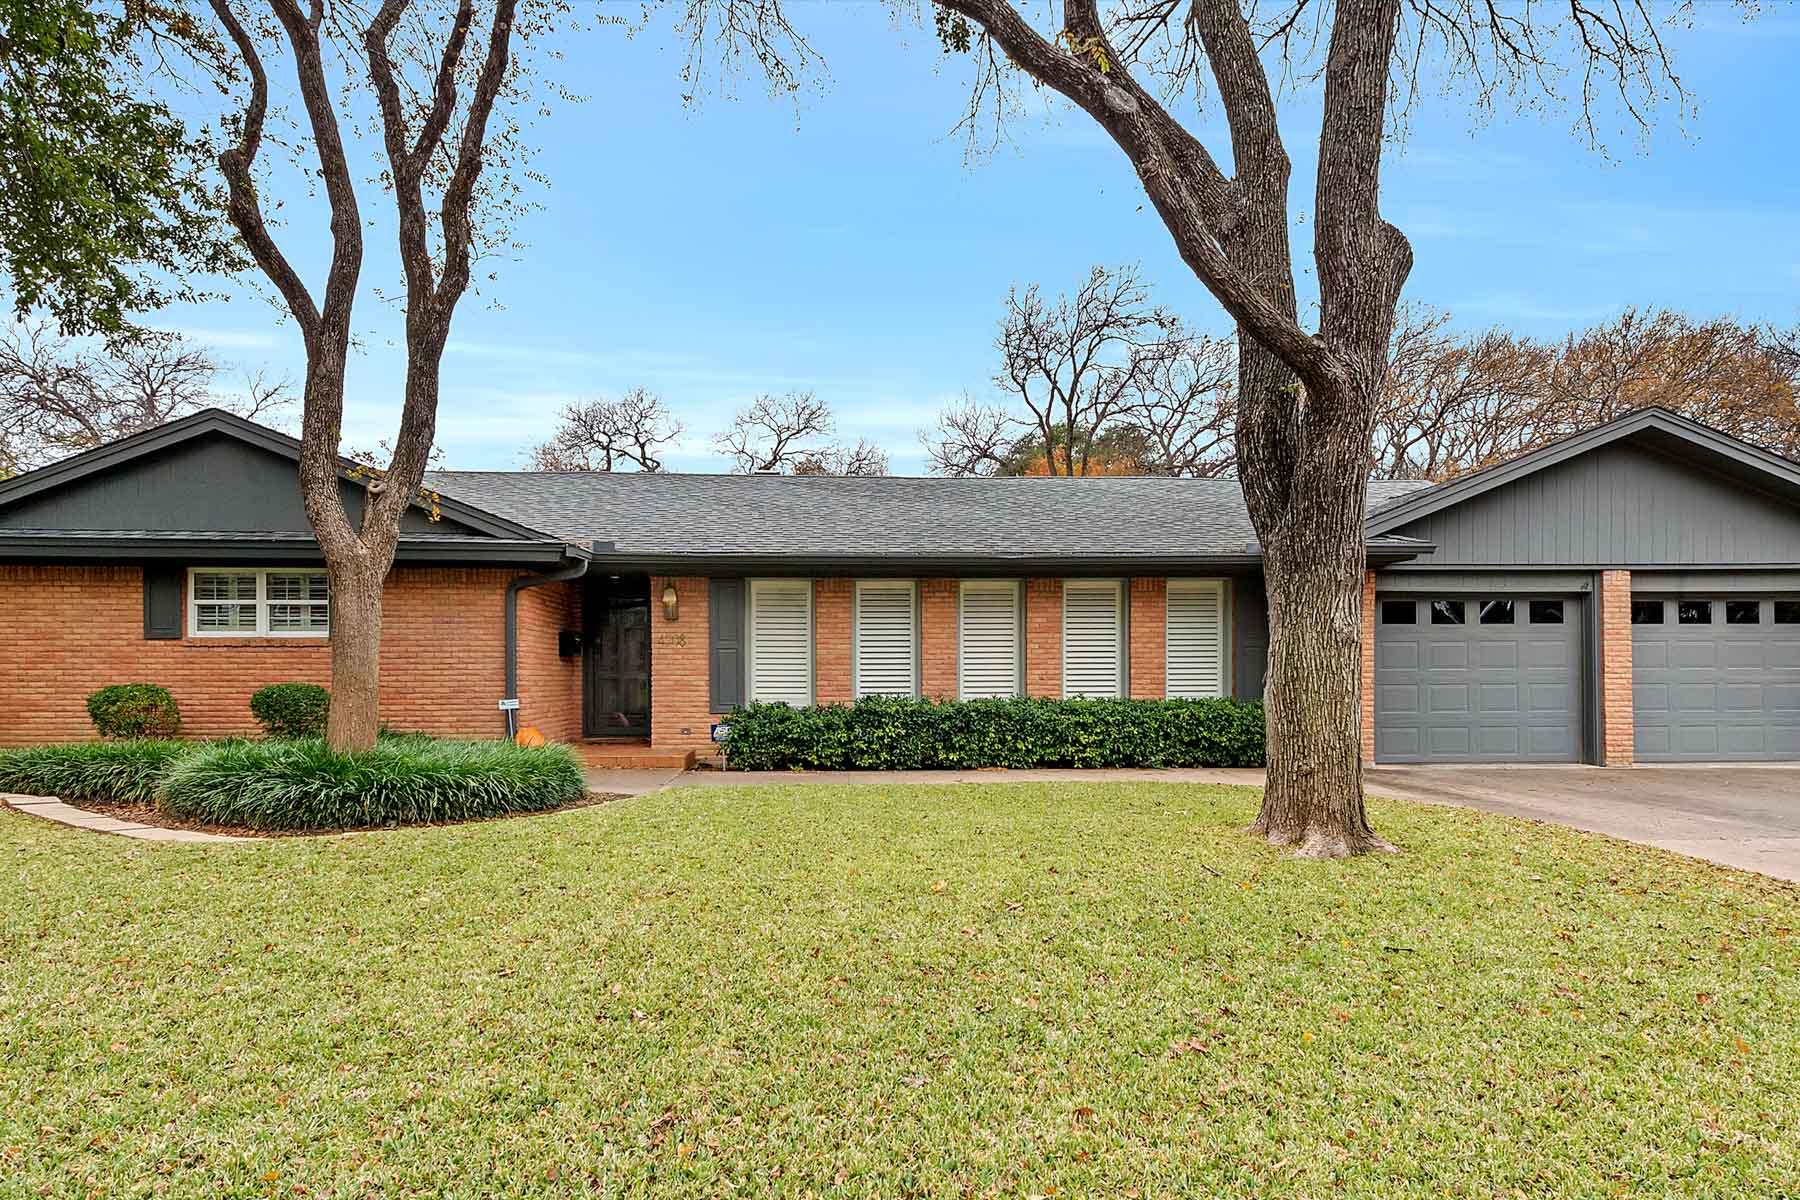 独户住宅 为 销售 在 4308 Inwood Road, Fort Worth 4308 Inwood Rd 沃斯堡市, 得克萨斯州, 76109 美国